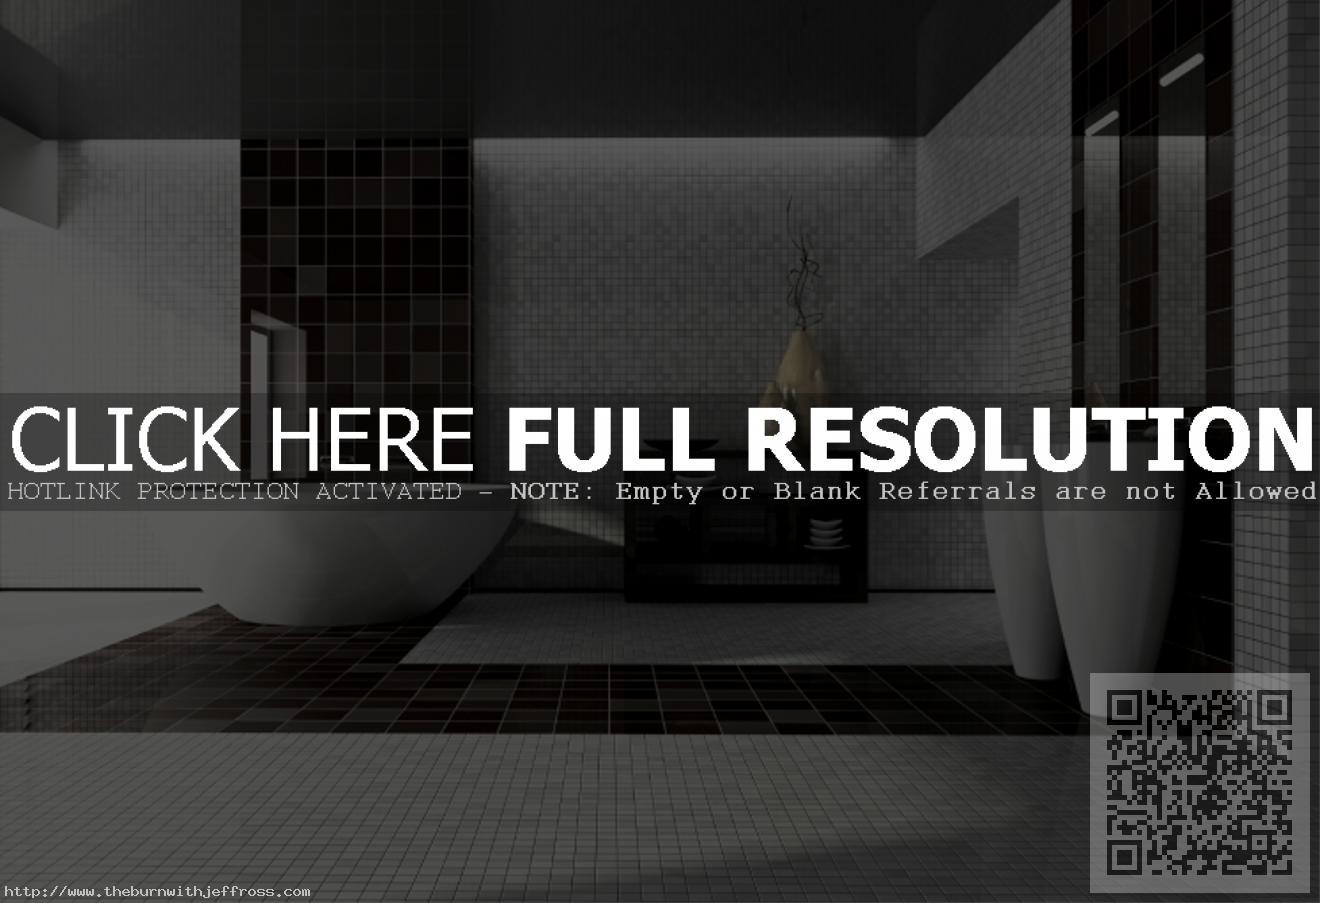 modern-luxury-bathroom-design-showing-grey-black-square-pattern-ceramic-tile-flooring